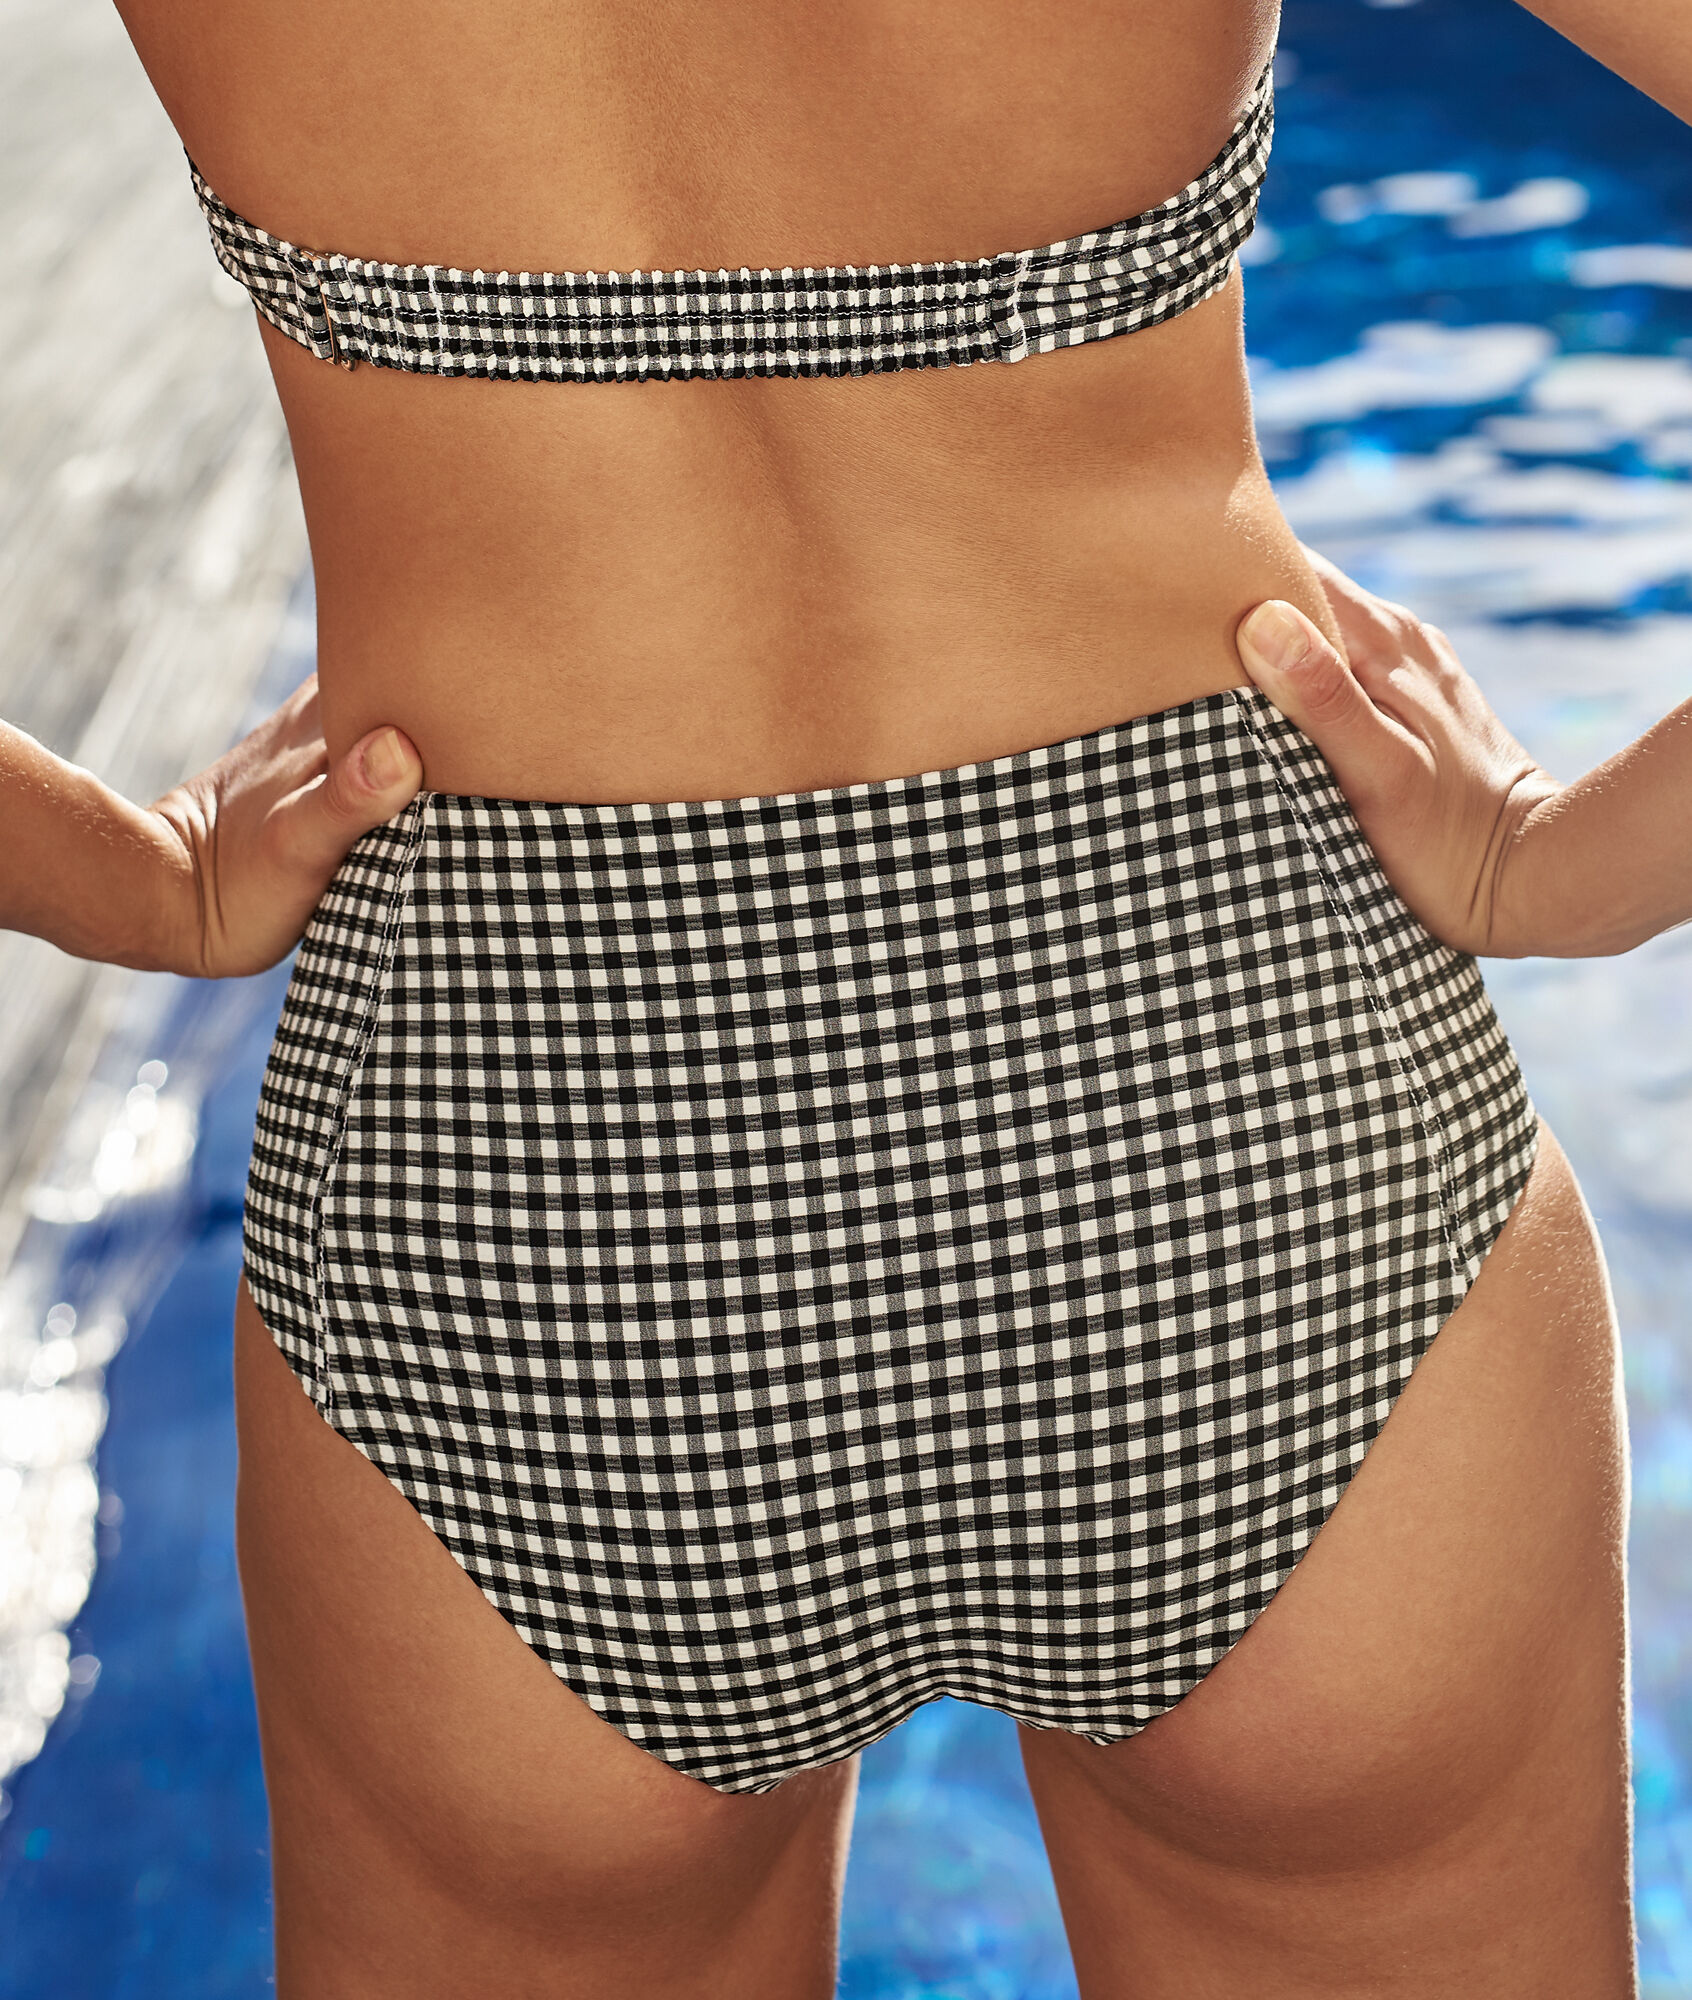 bas de bikini taille haute rachelle noir blanc etam